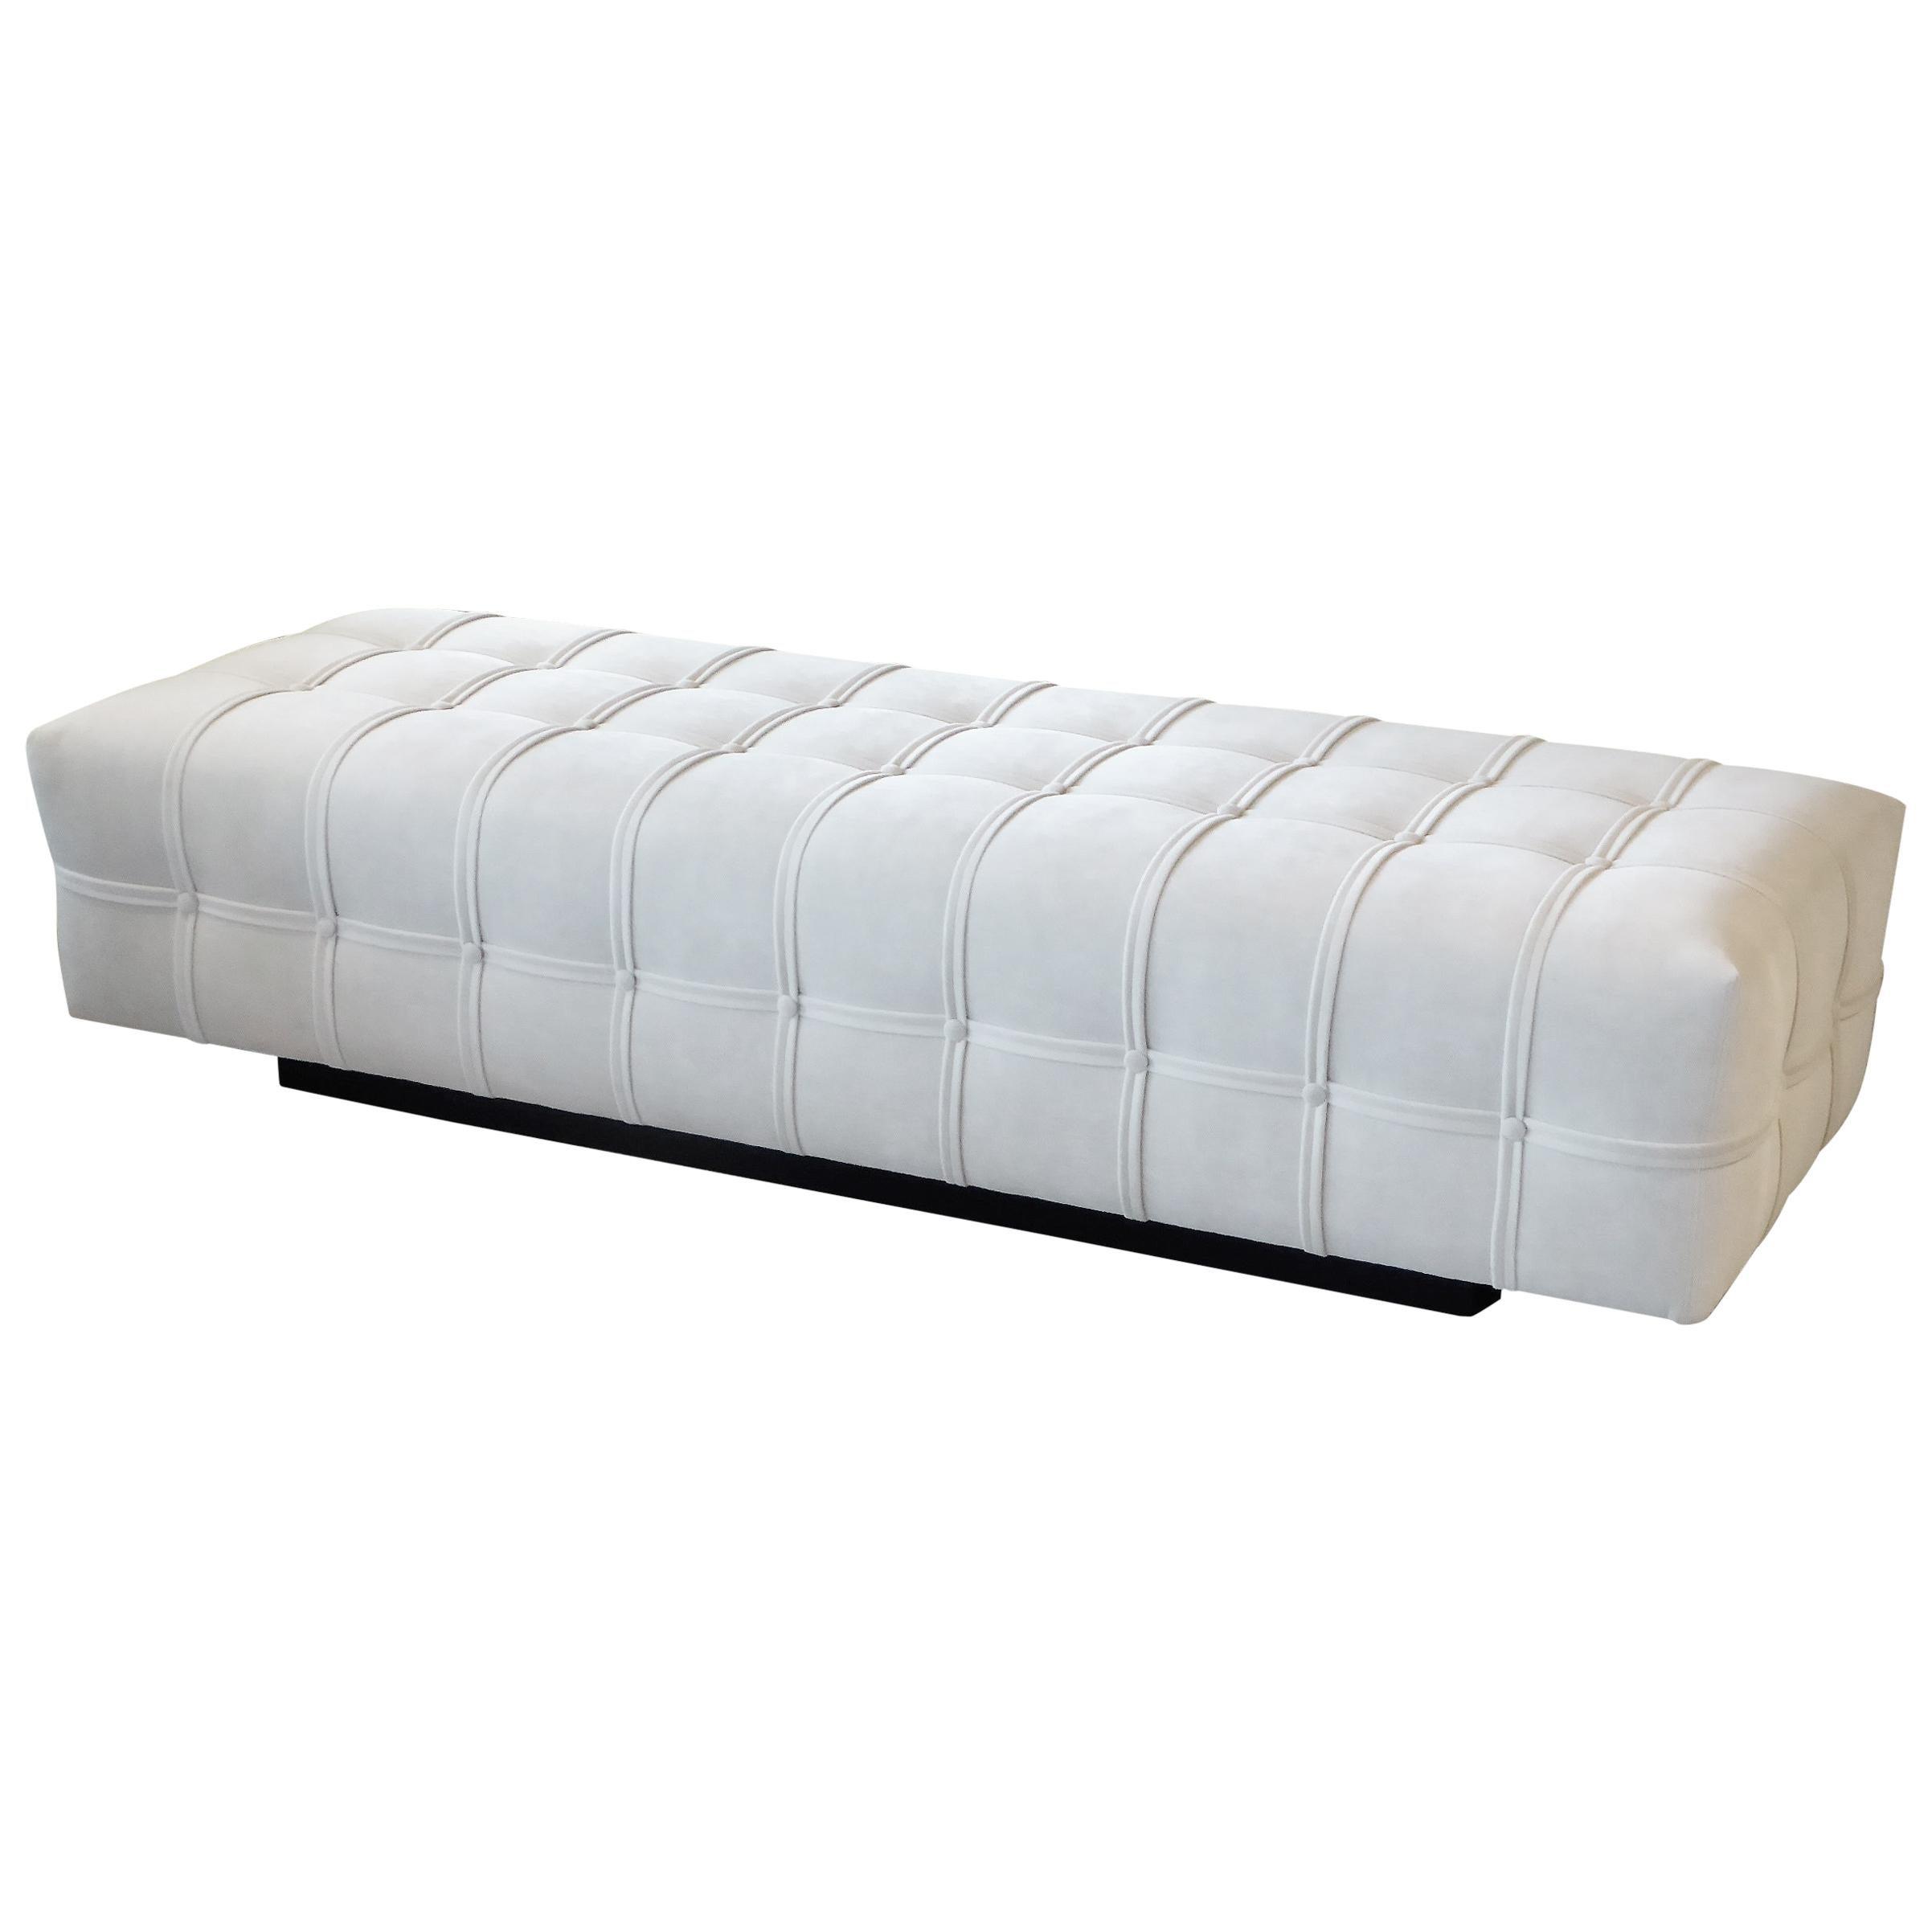 1970s Plush Brayton International Modern Sofa Bench, 2 Available